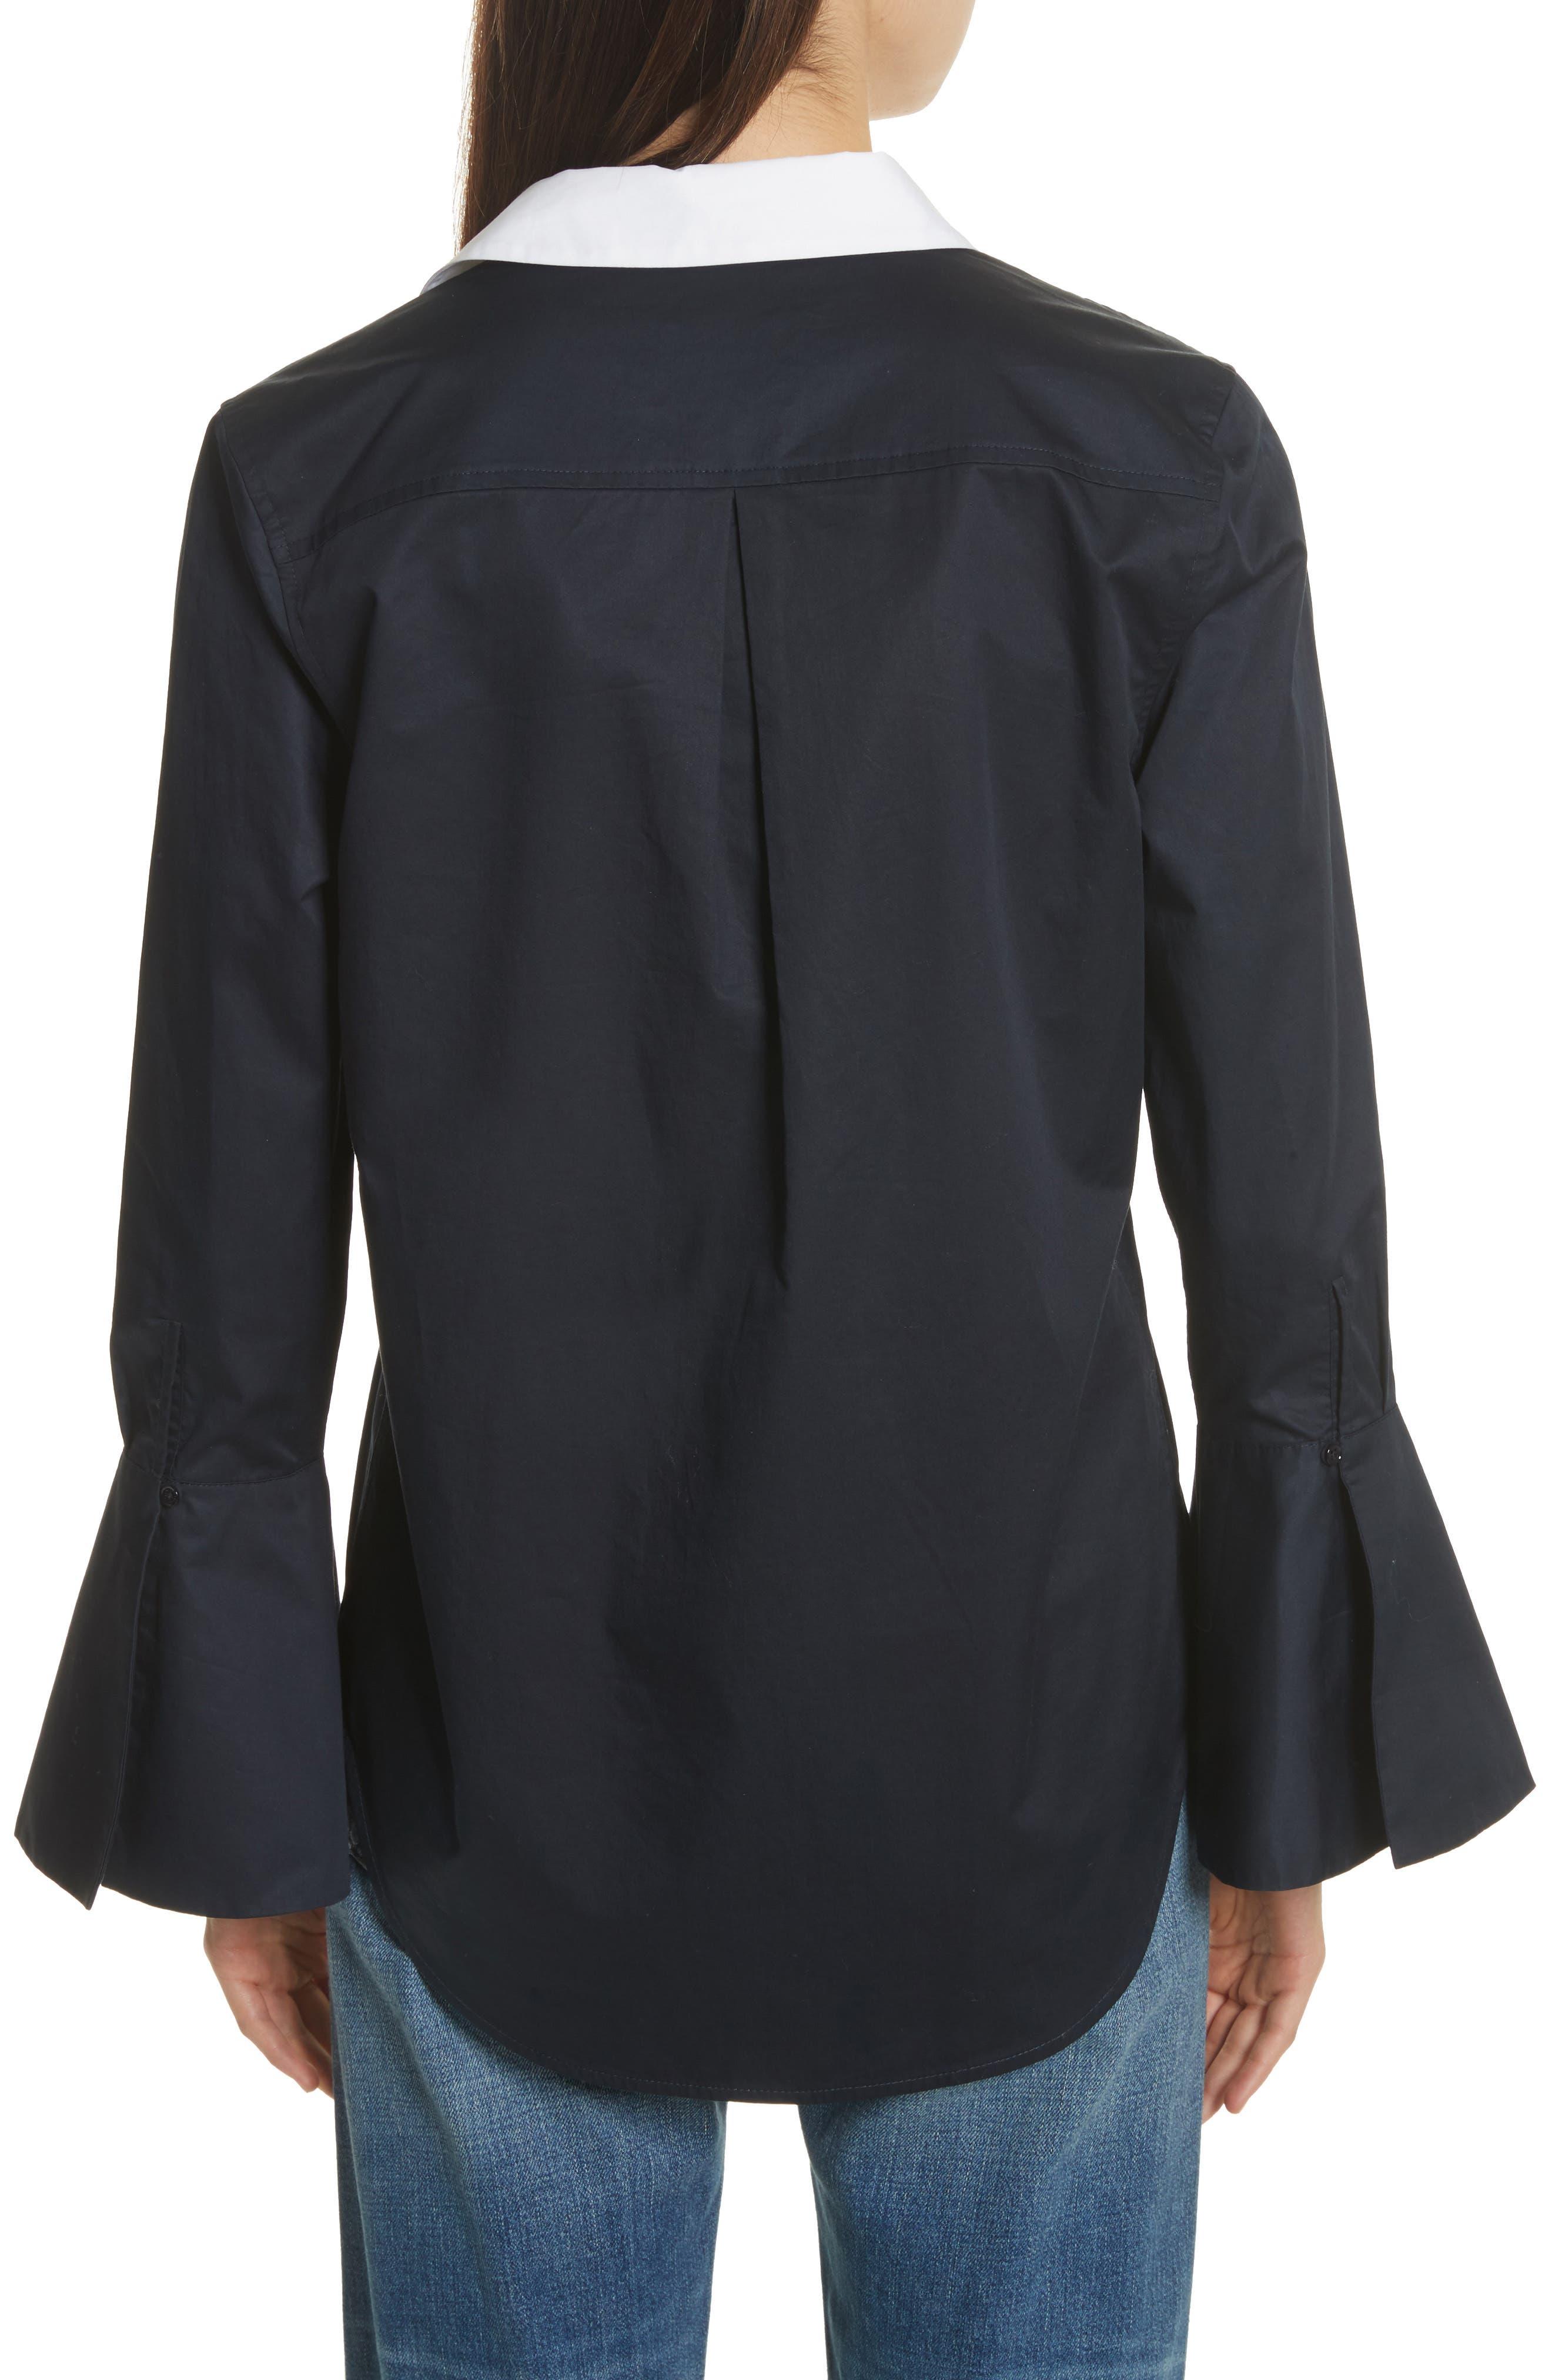 Darla Bell Cuff Shirt,                             Alternate thumbnail 2, color,                             Eclipse